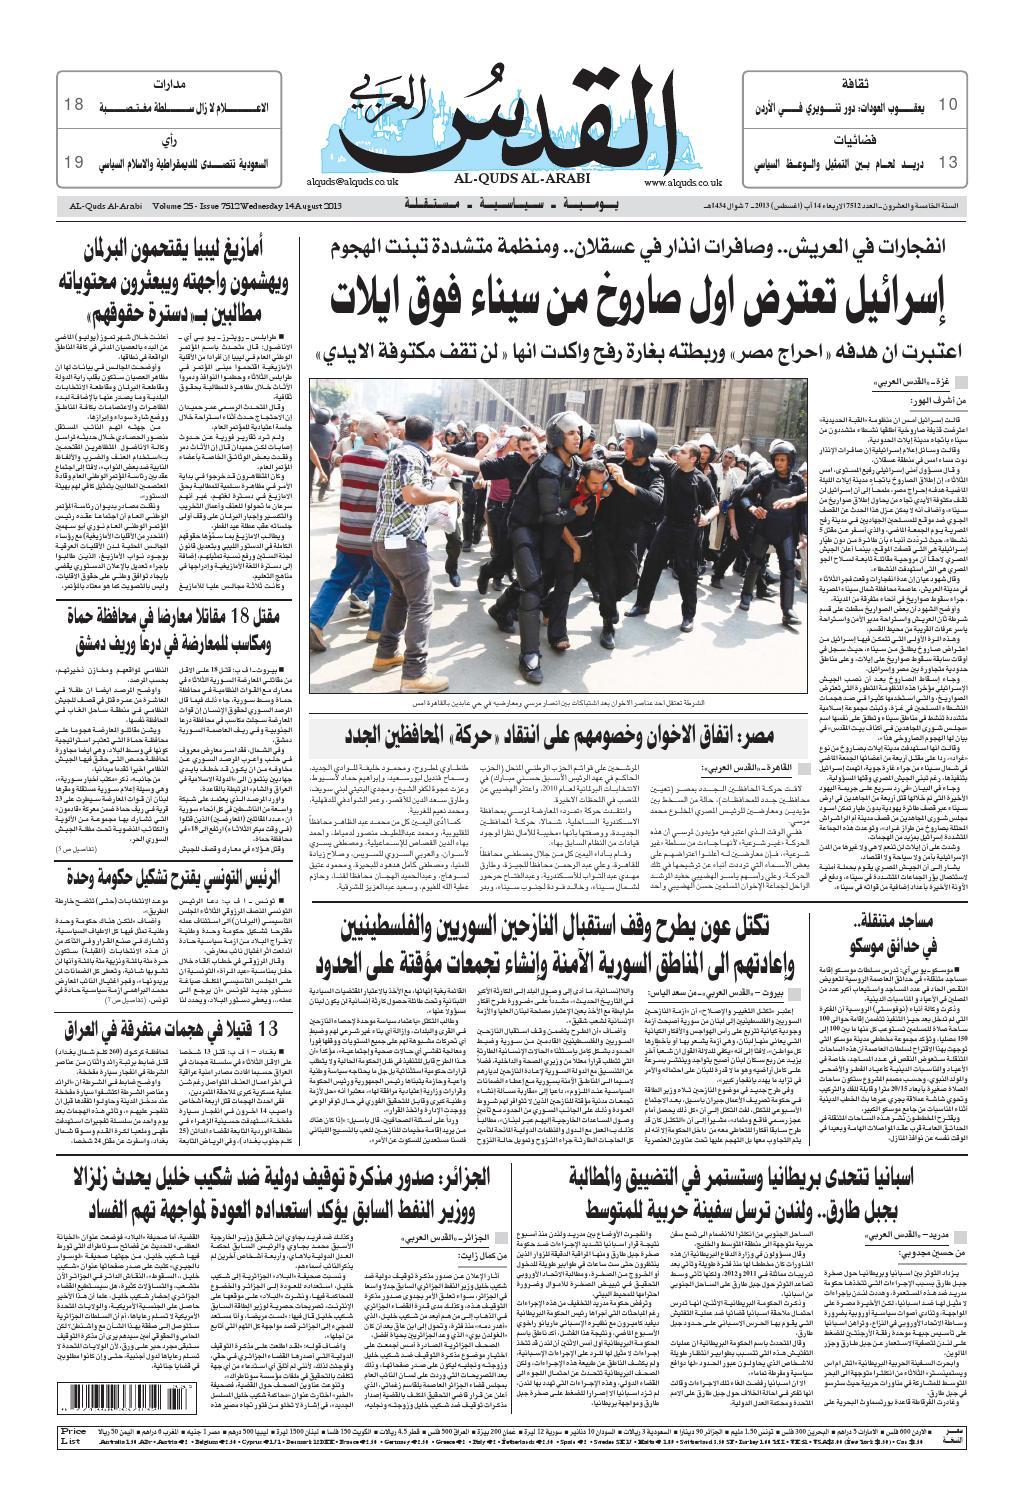 14356a69d صحيفة القدس العربي , الأربعاء 14.08.2013 by مركز الحدث - issuu